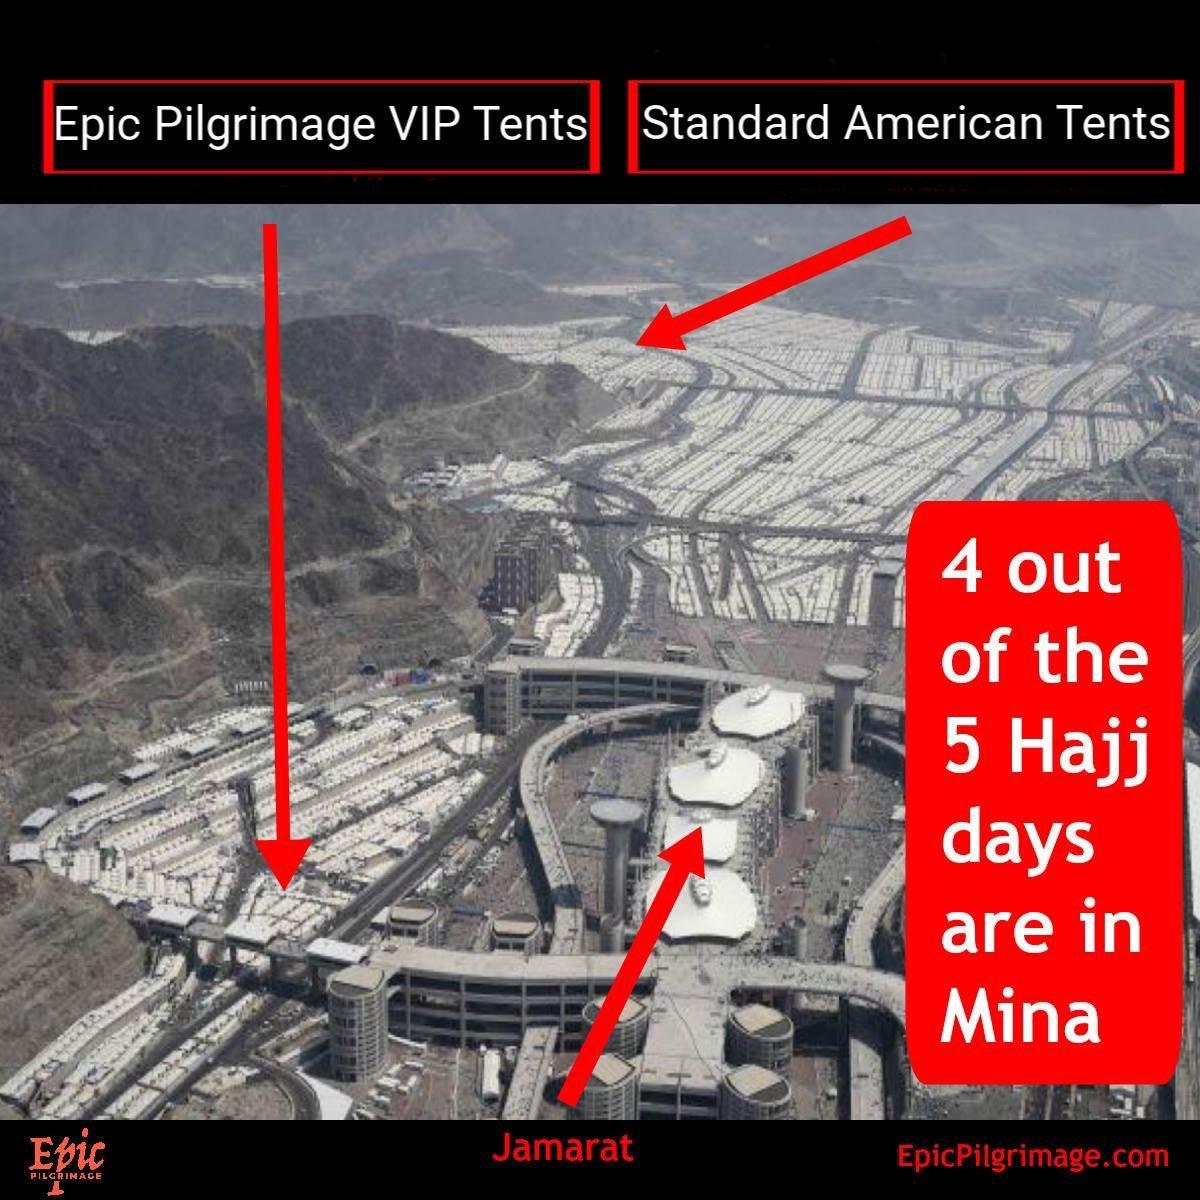 Hajj 2019 Epic Pilgrimage: Makkah, Madinah, Arafat